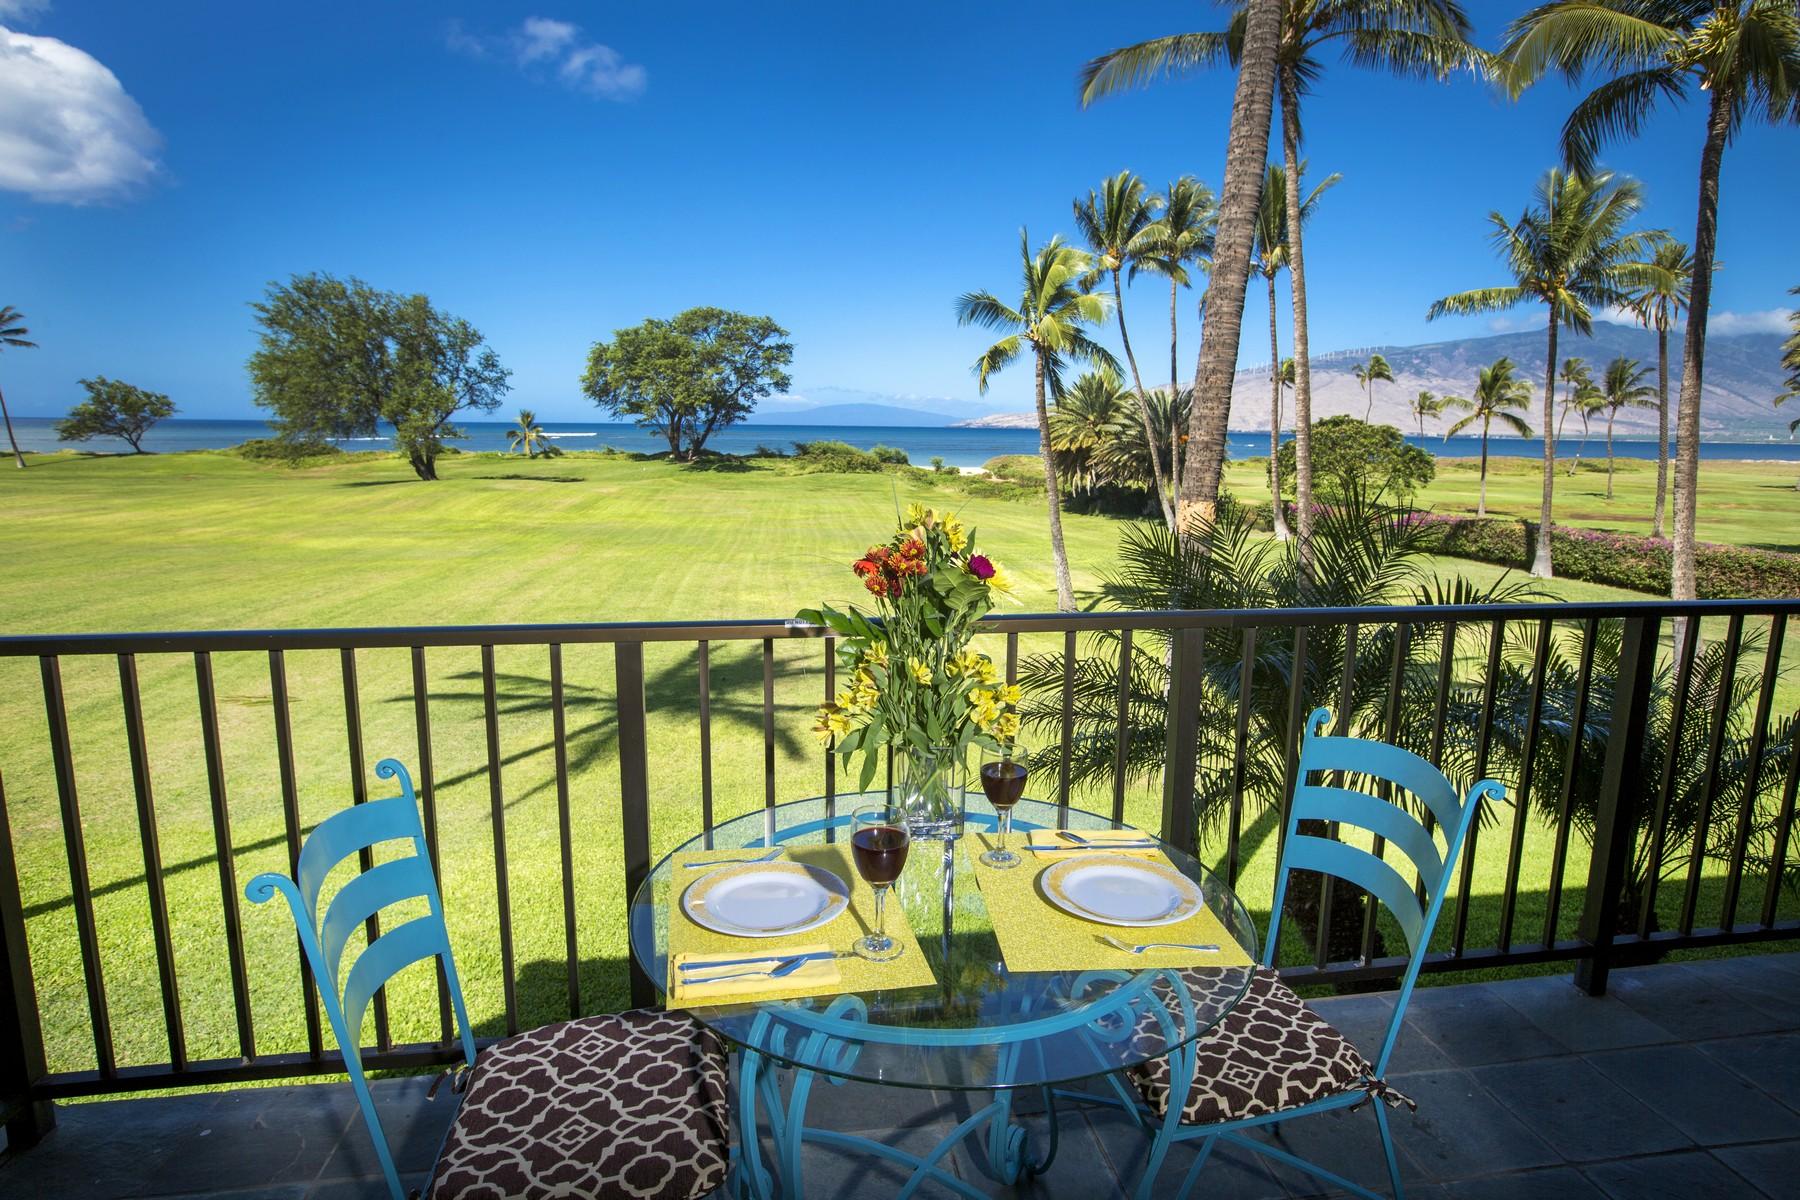 Nhà chung cư vì Bán tại Beachfront Living 940 South Kihei Road, Luana Kai A-202 Kihei, Hawaii 96753 Hoa Kỳ